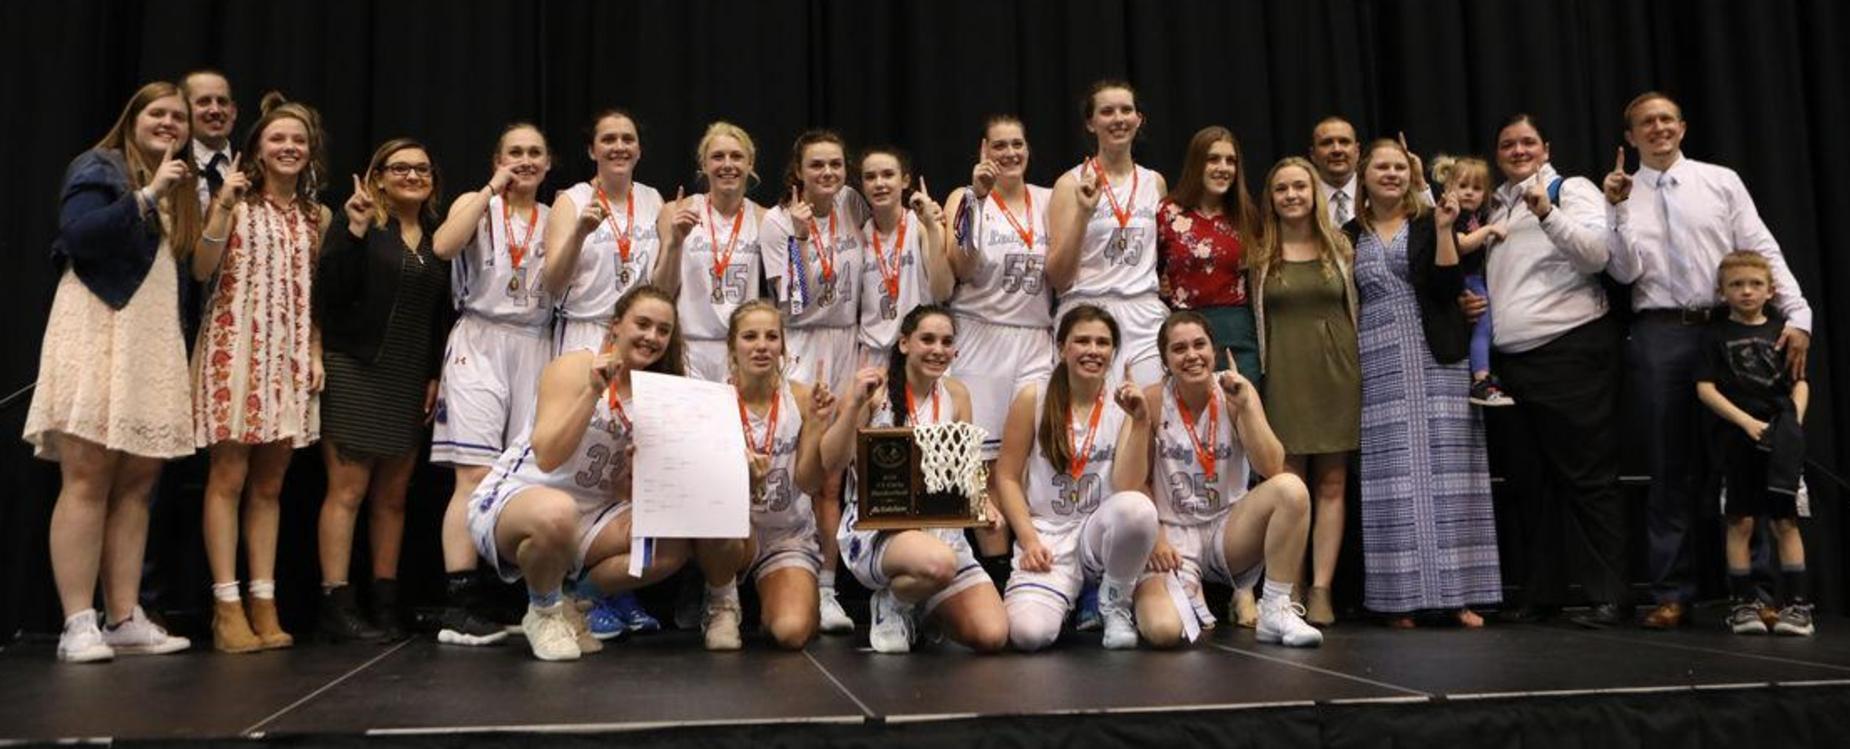 2018 Class 3A State Basketball Champions!